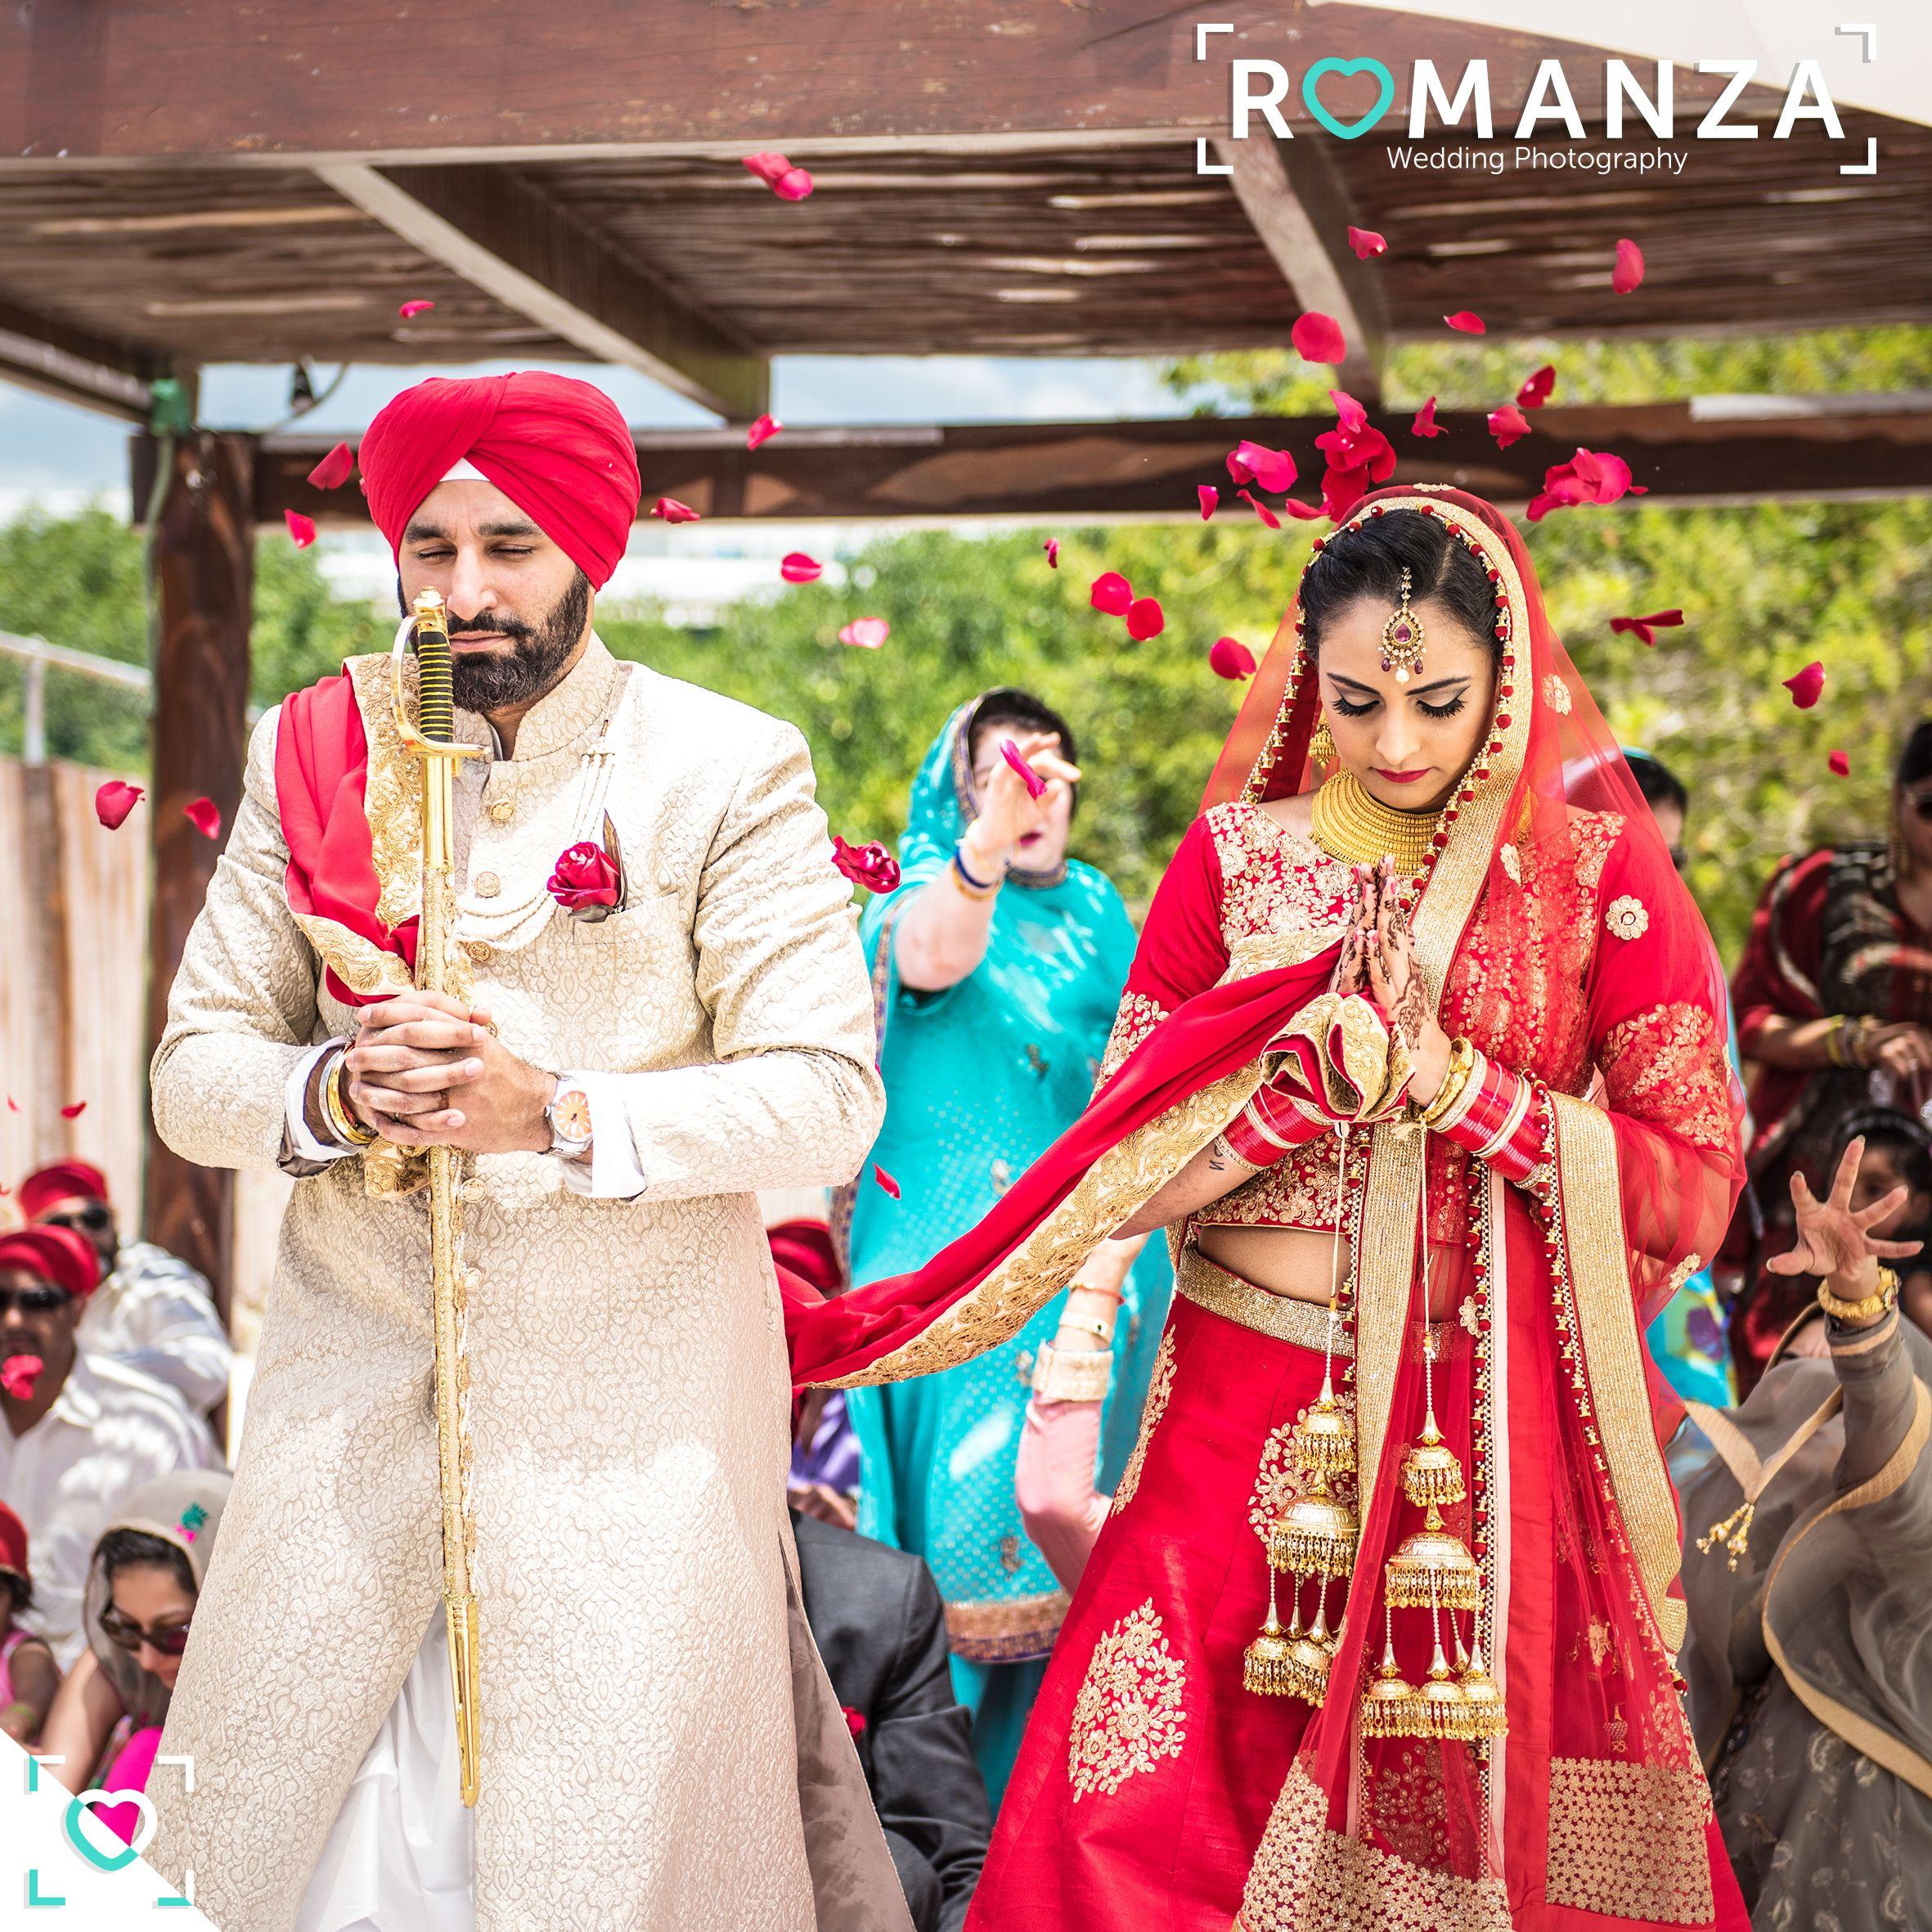 #RomanzaWedding #WeddingRings #Romanza @romanzamx #WeddingPhotography #WeddingPhotographers #WeddingIdeas www.romanza.com.mx